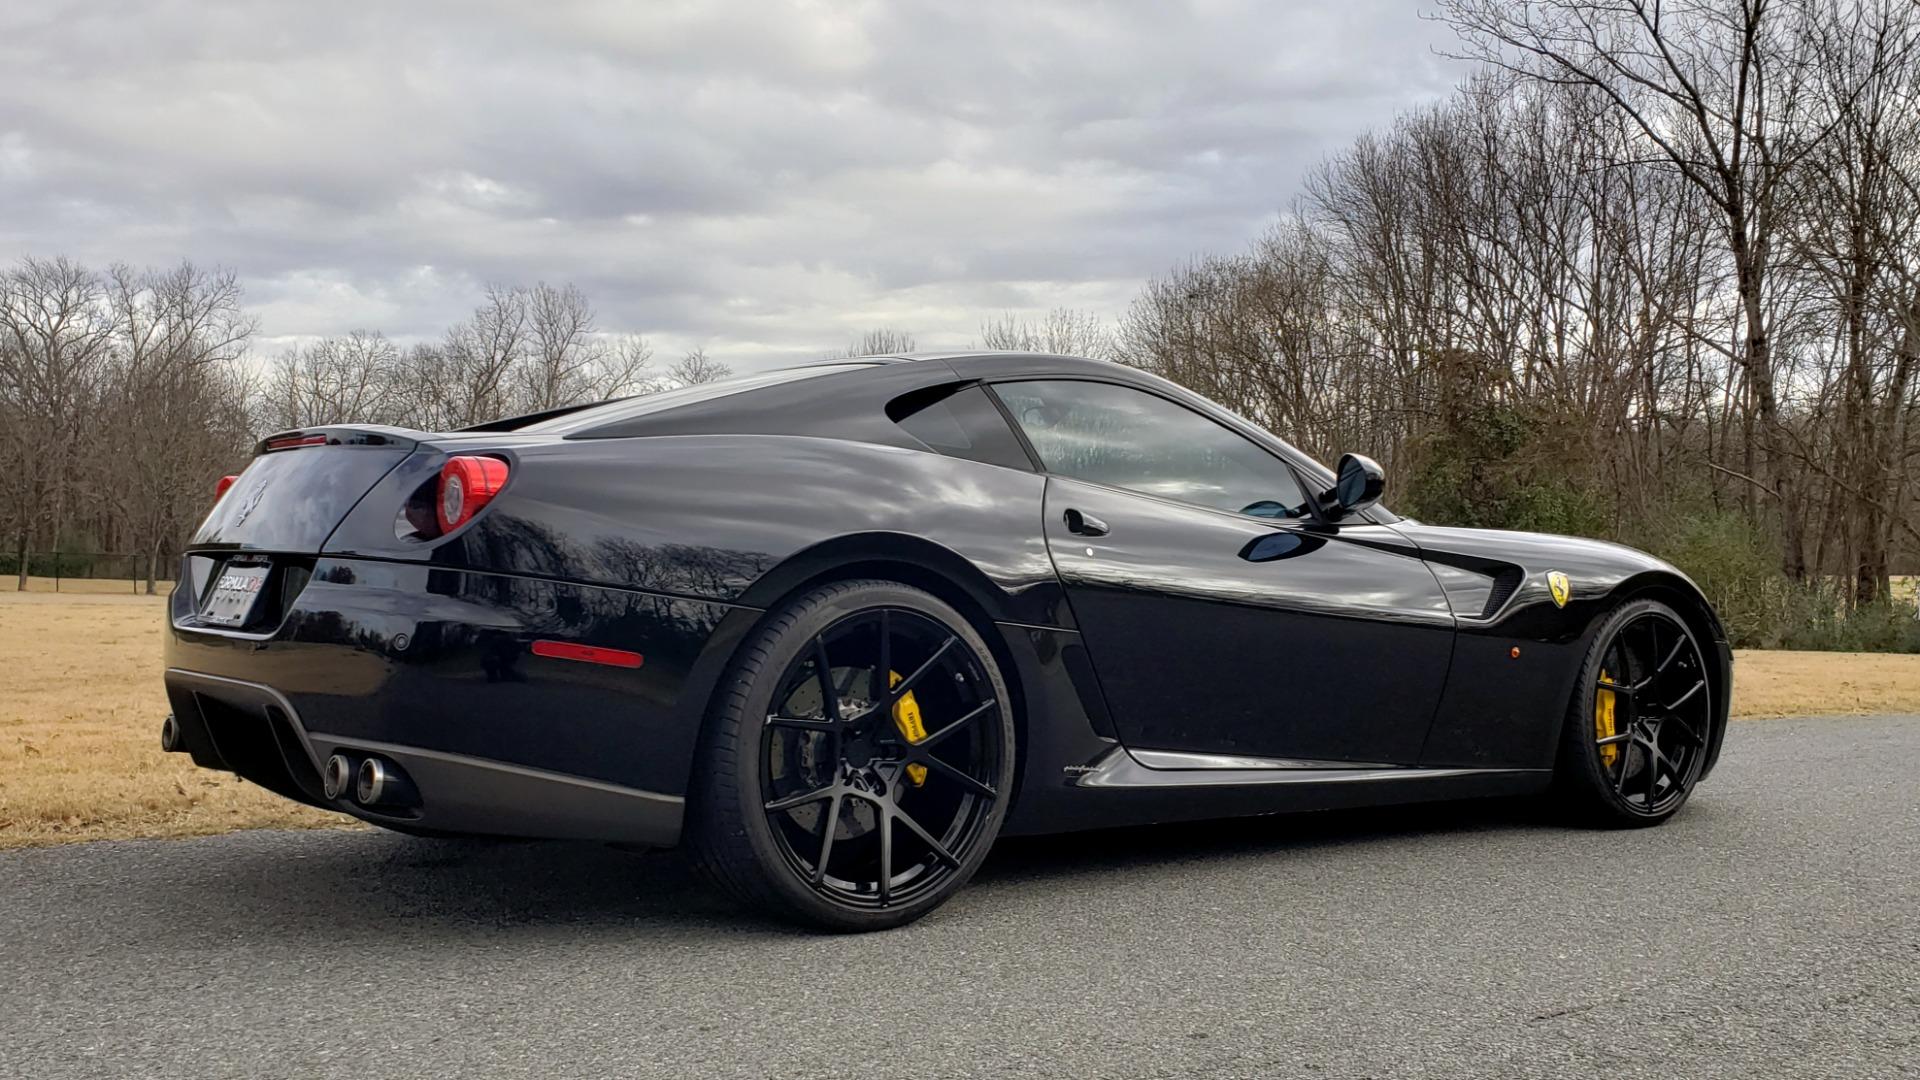 Used 2007 Ferrari 599 GTB FIORANO HGTE / V12 / F1 TRANS / NAV / BOSE / CUSTOM WHEELS for sale $109,999 at Formula Imports in Charlotte NC 28227 6